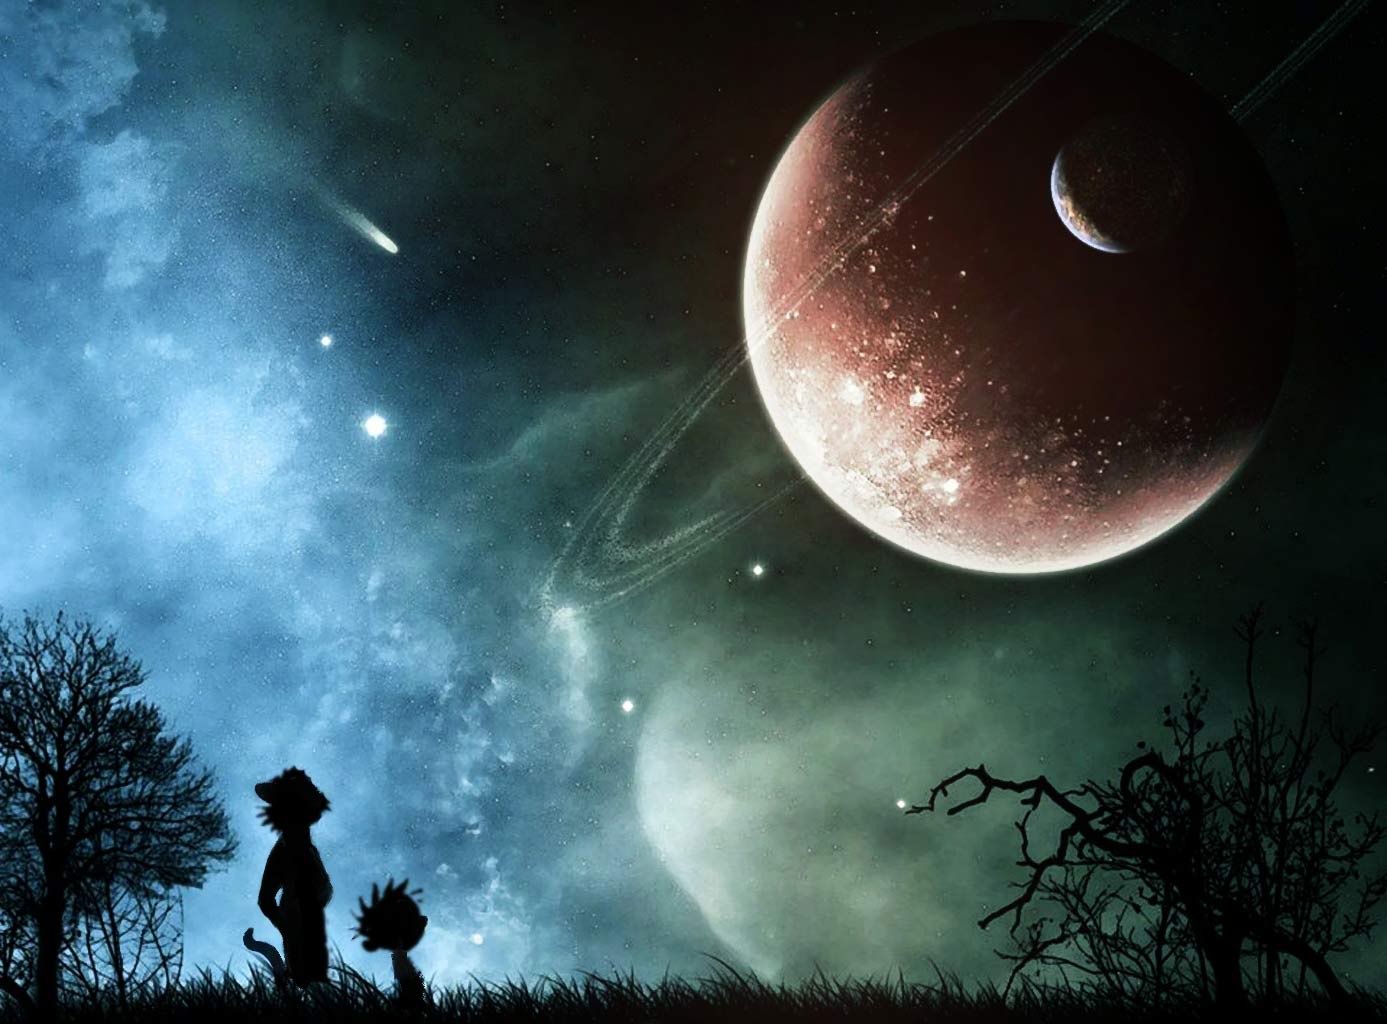 Free Download Planets Calvin And Hobbes Artwork Desktop 1387x1024